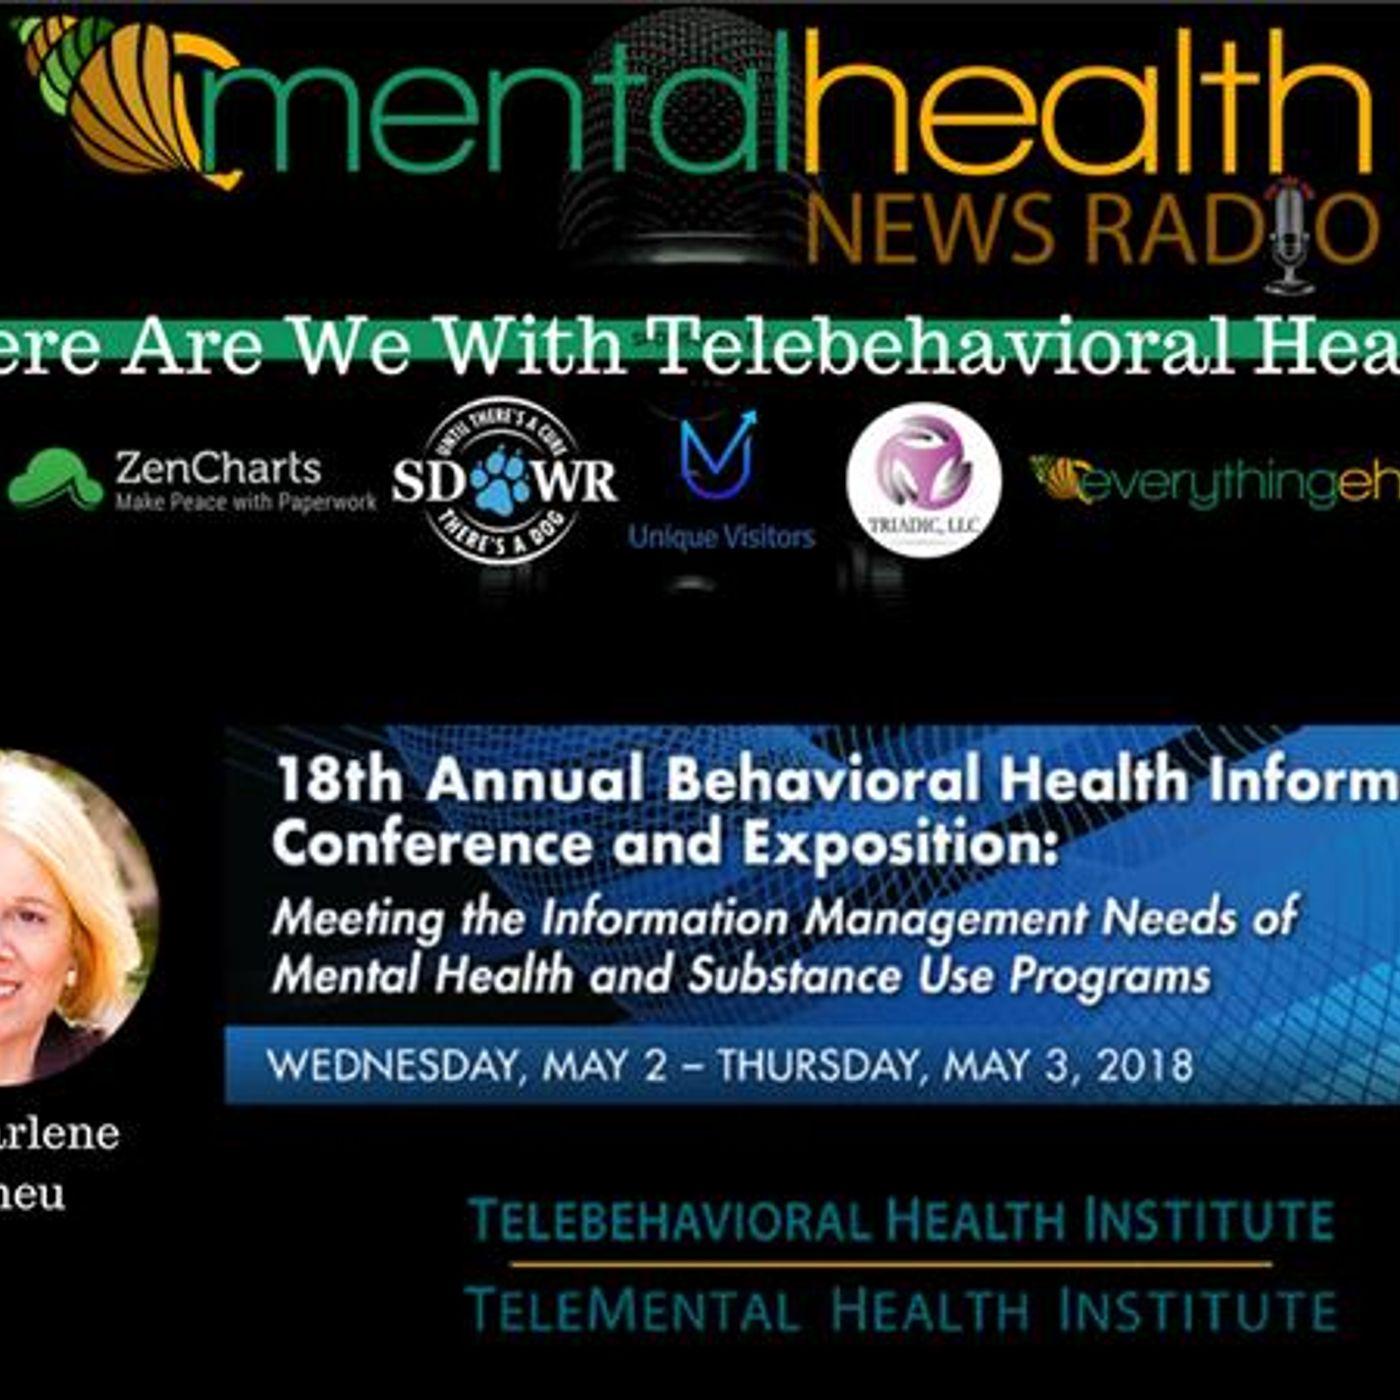 Mental Health News Radio - Where Are We With Telebehavioral Health? Dr. Marlene Maheu